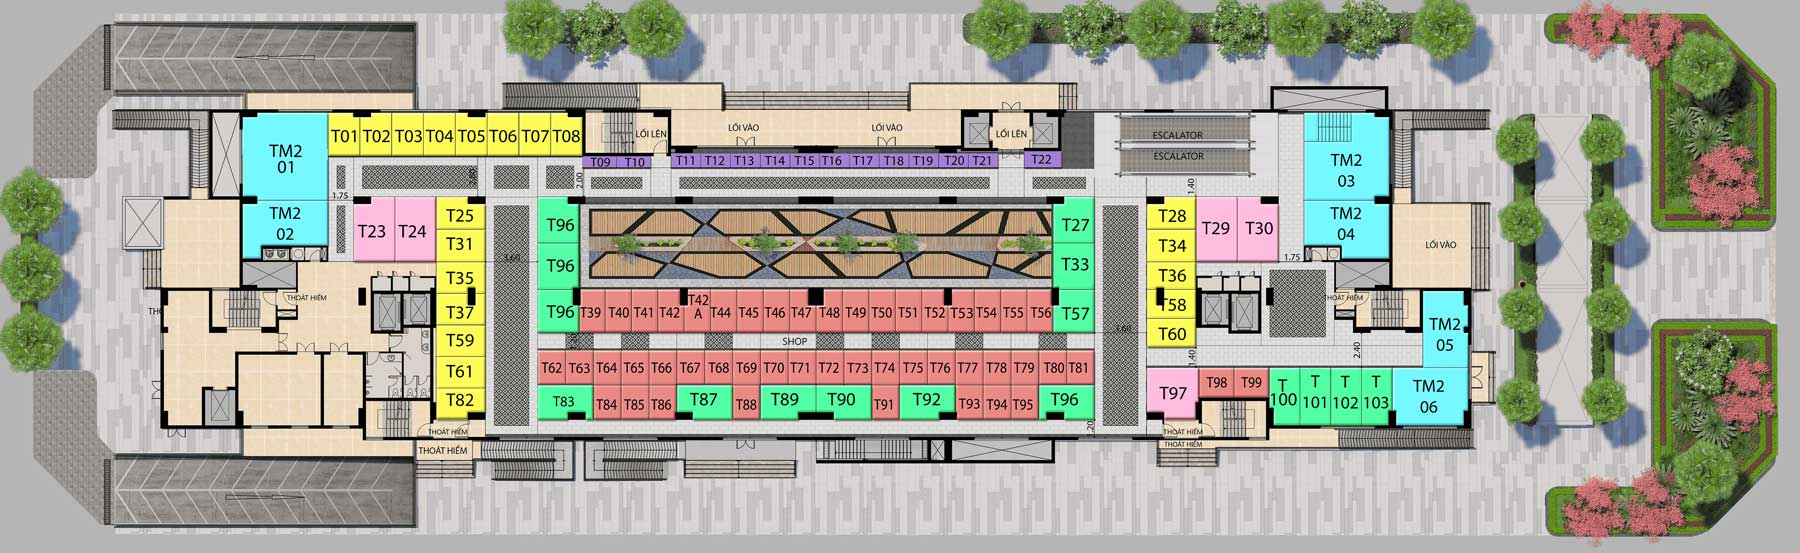 Saigon Metro Mall Mặt bằng tầng 1